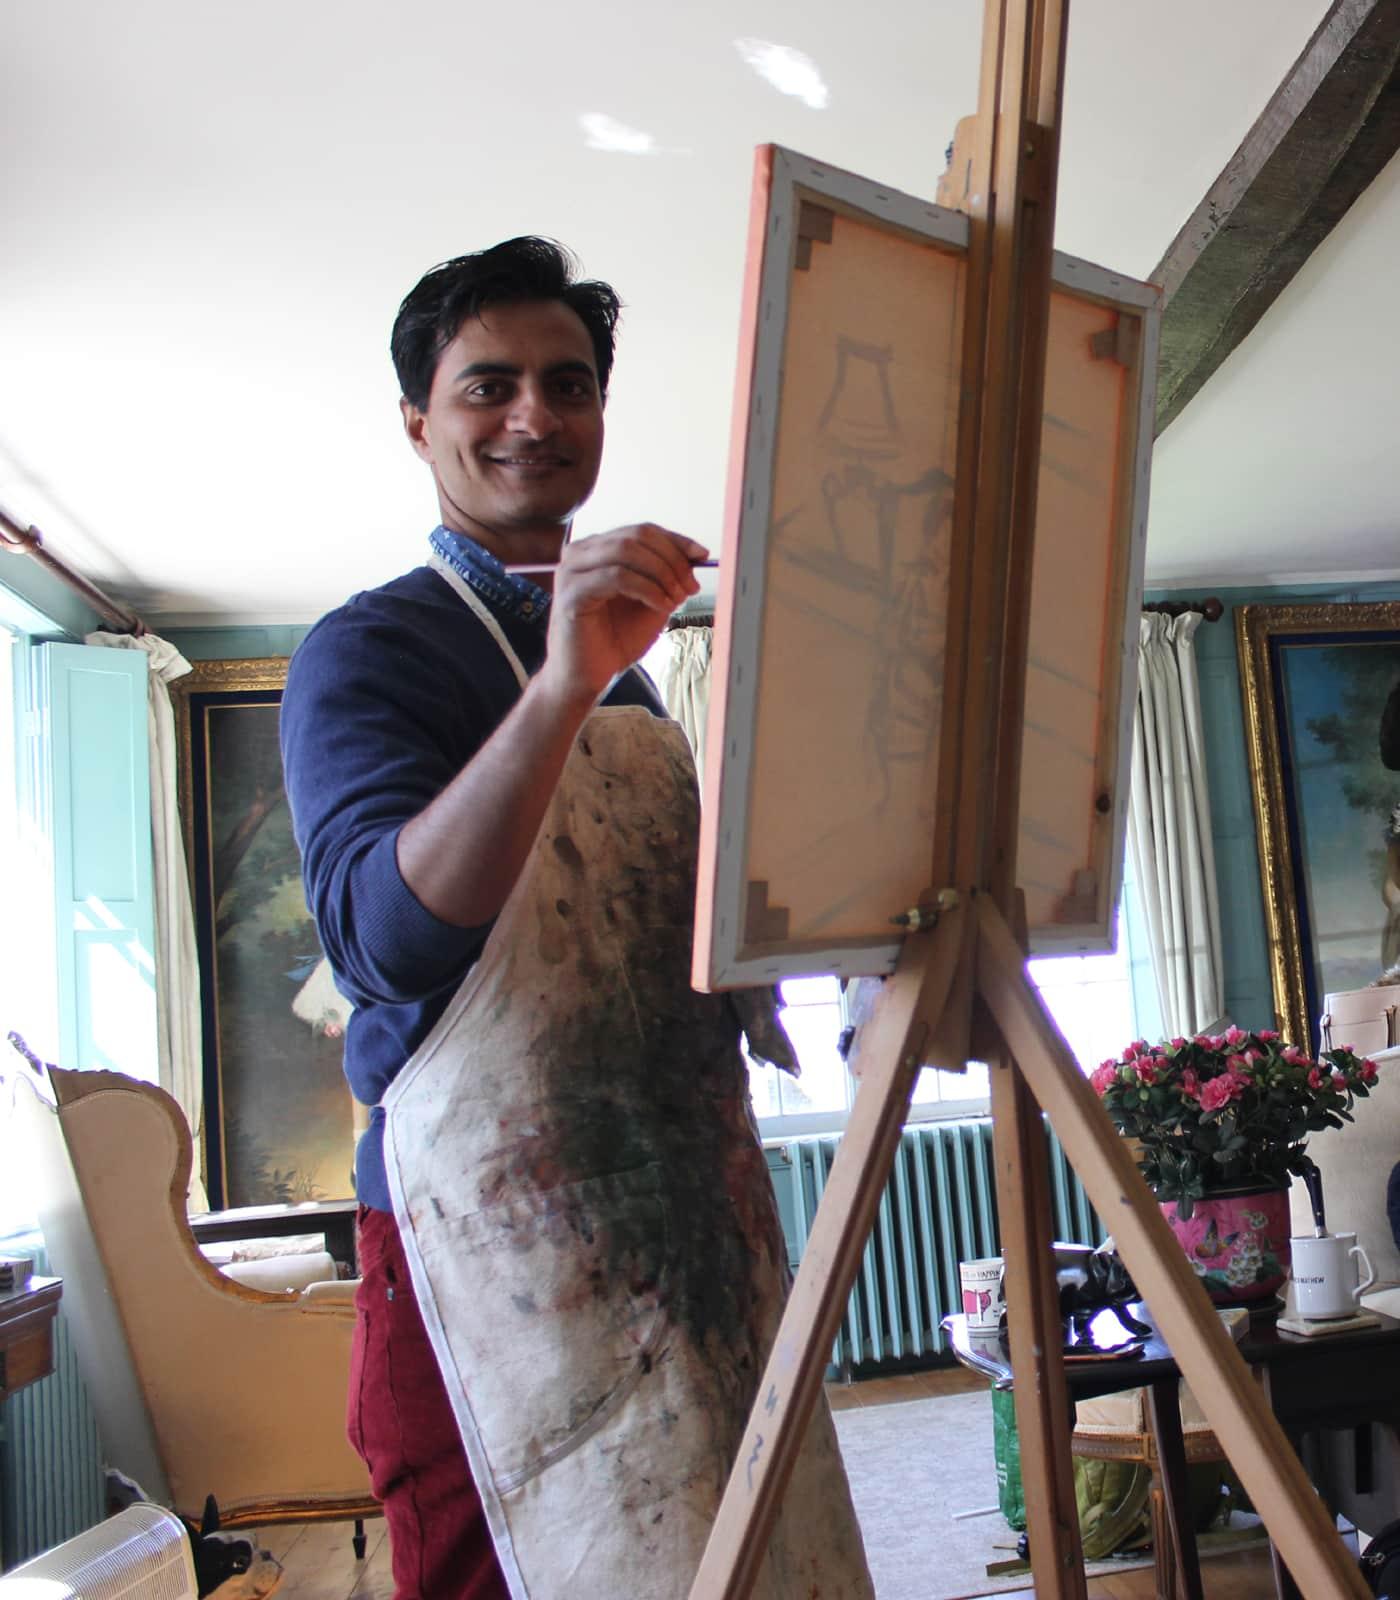 tushar-sabale-artist-profile-1600-x-900